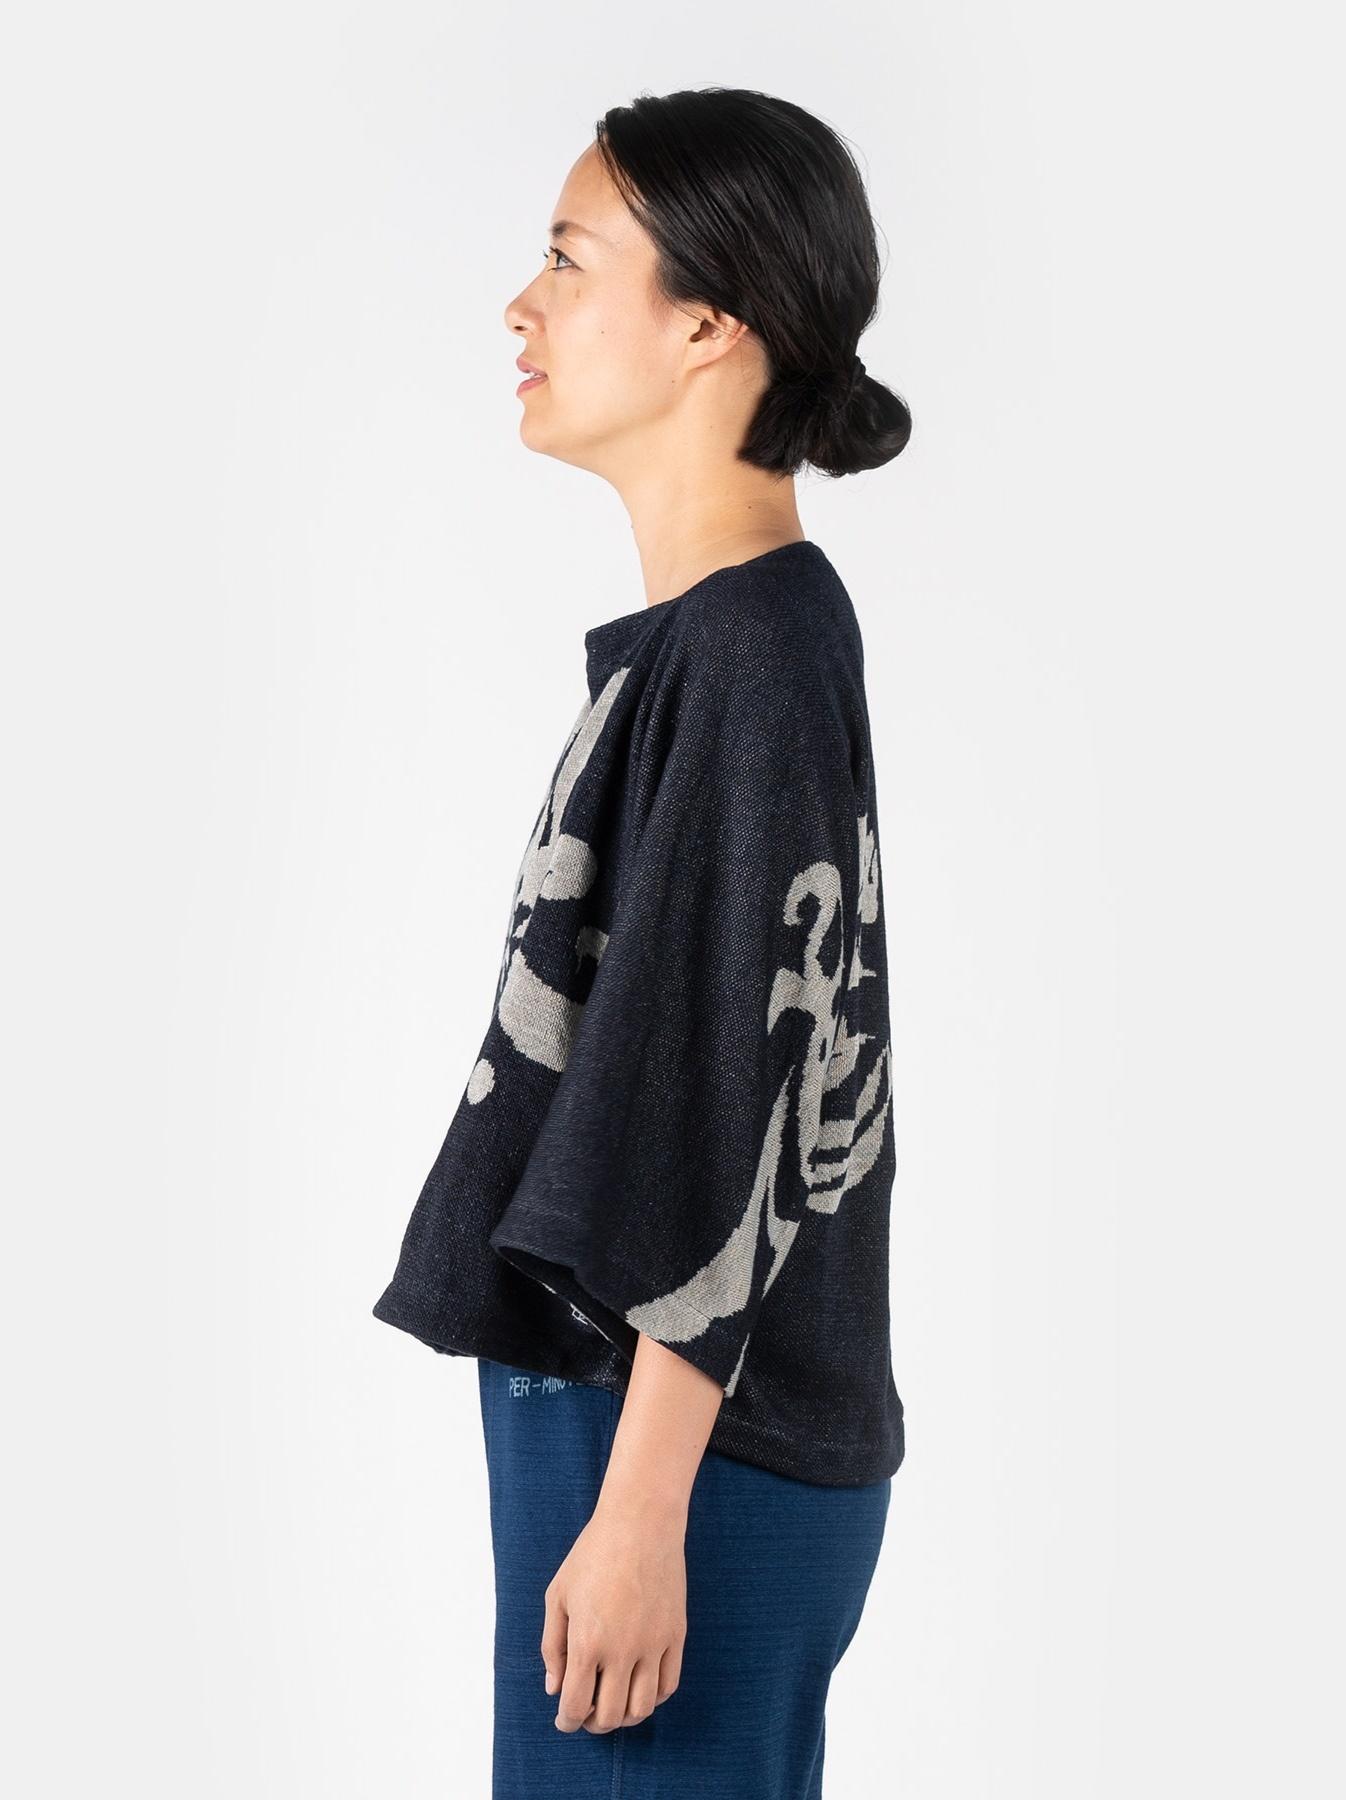 WH Indigo Linen Jacquard Yakko T-shirt-4